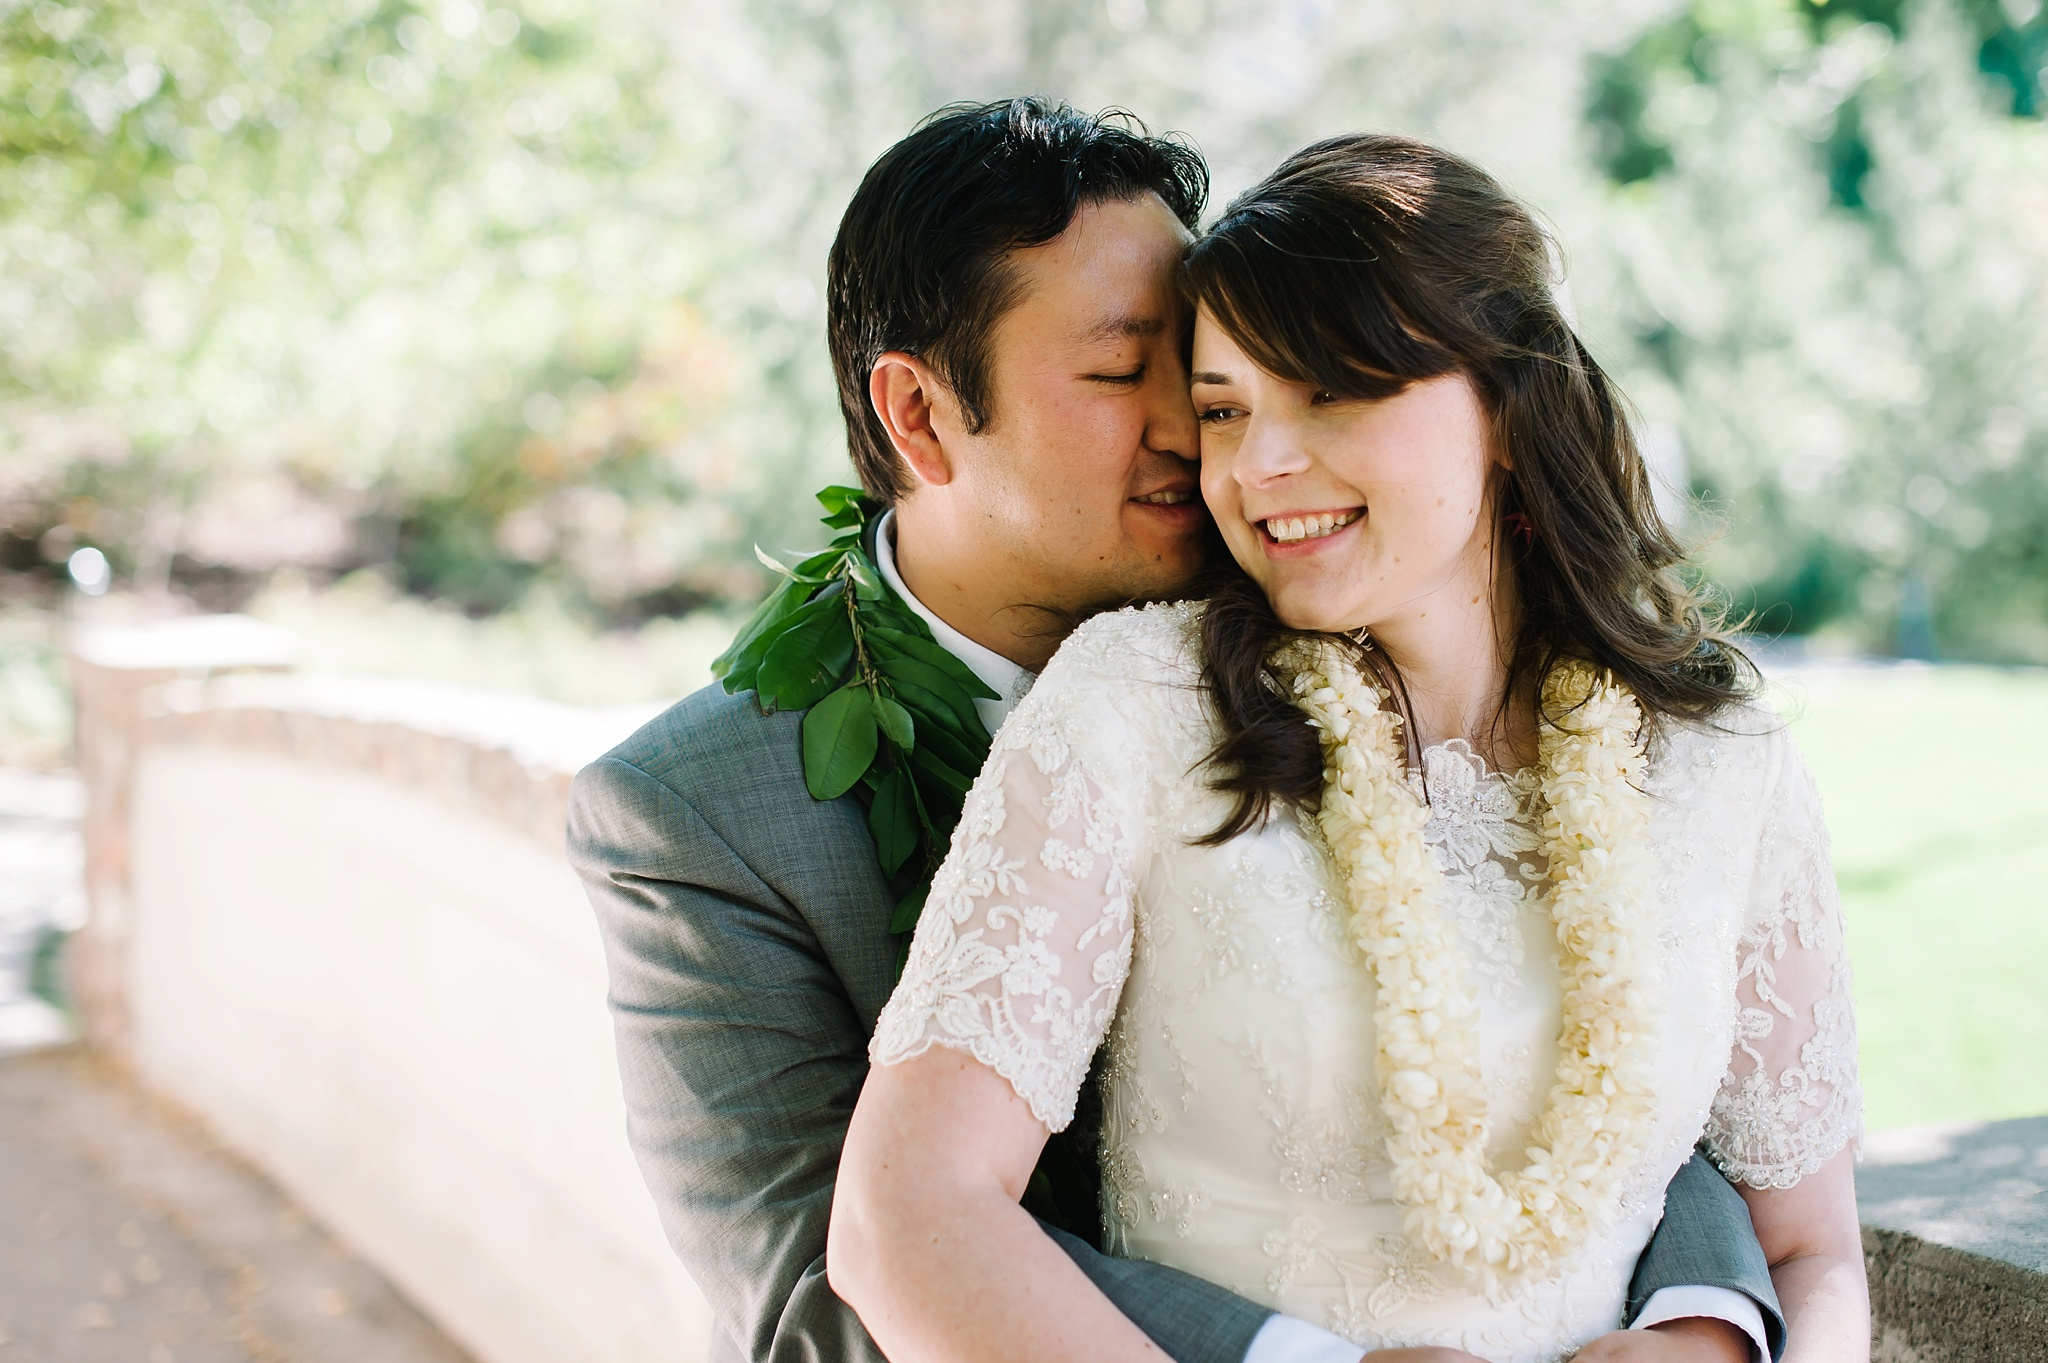 Park City Wedding Photographer Ali Sumsion 068